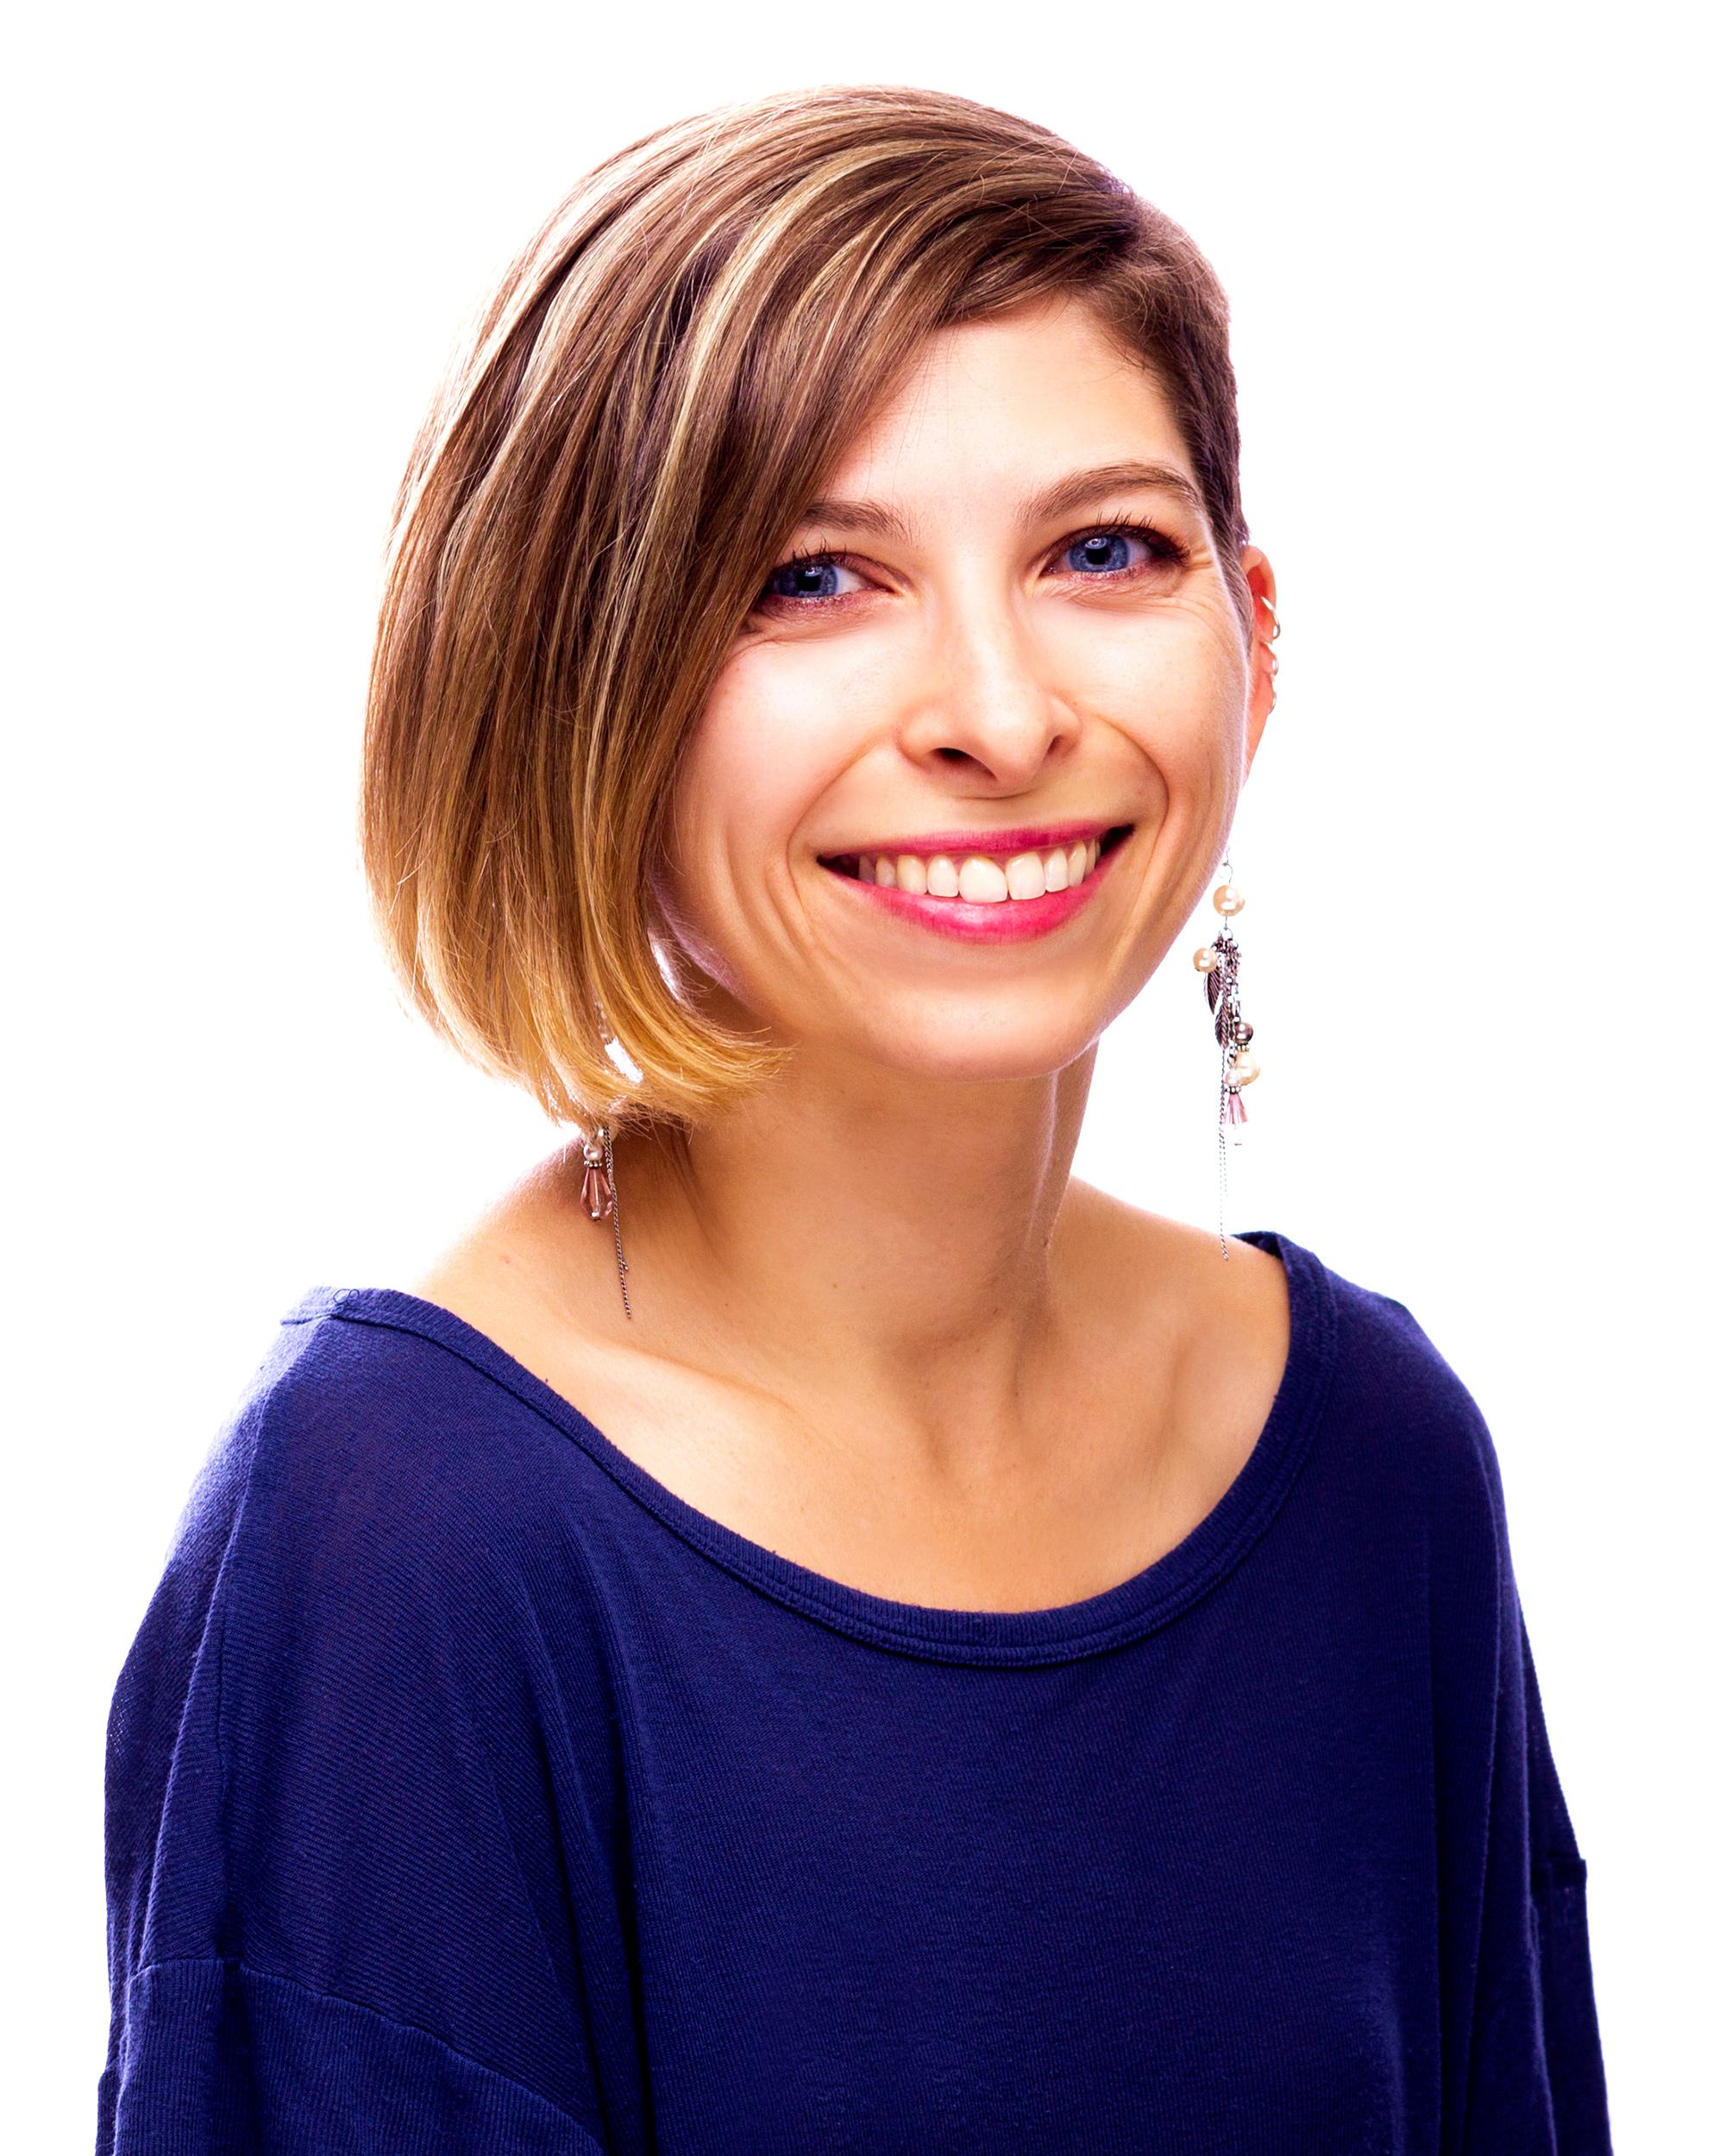 Amanda Freise, Research Director